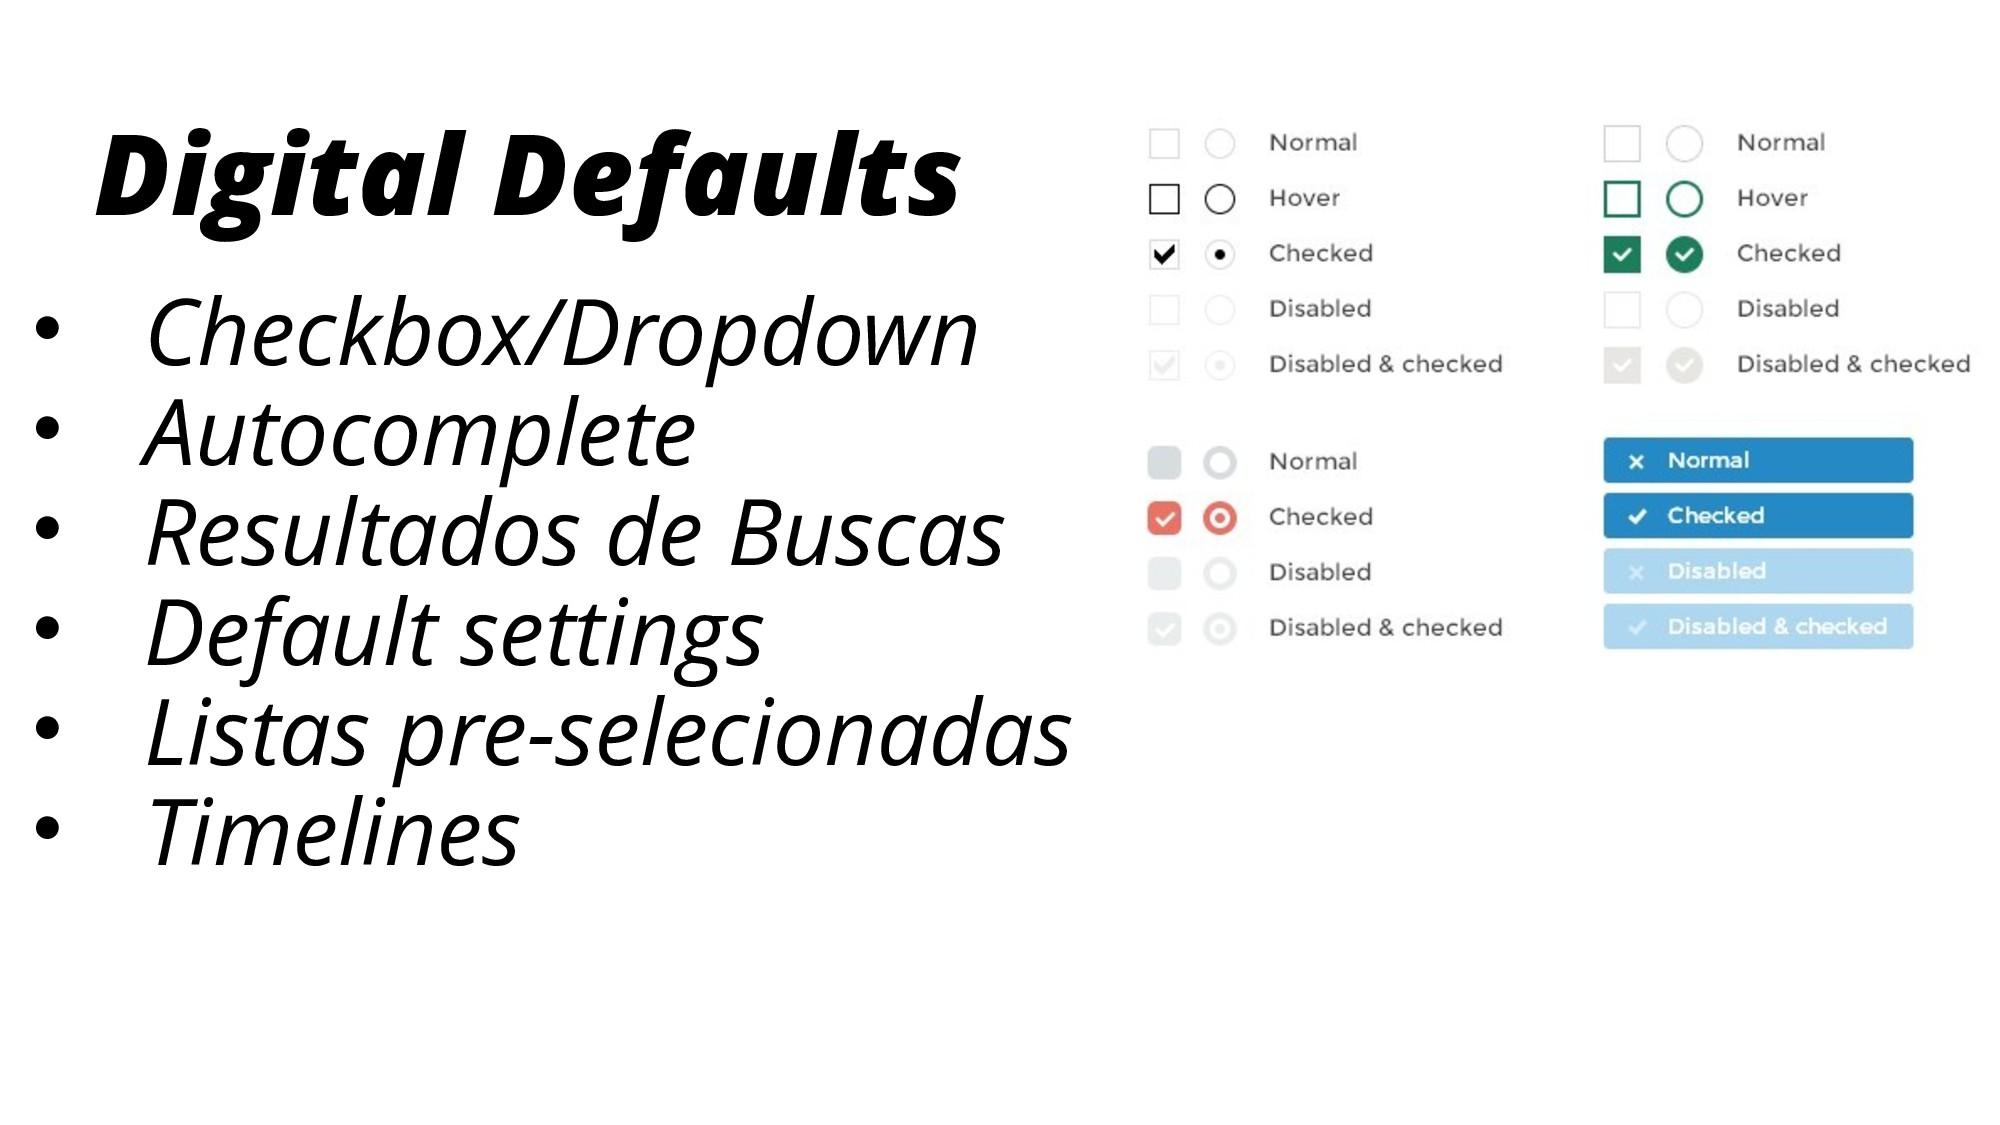 Digital Defaults • Checkbox/Dropdown • Autocomp...